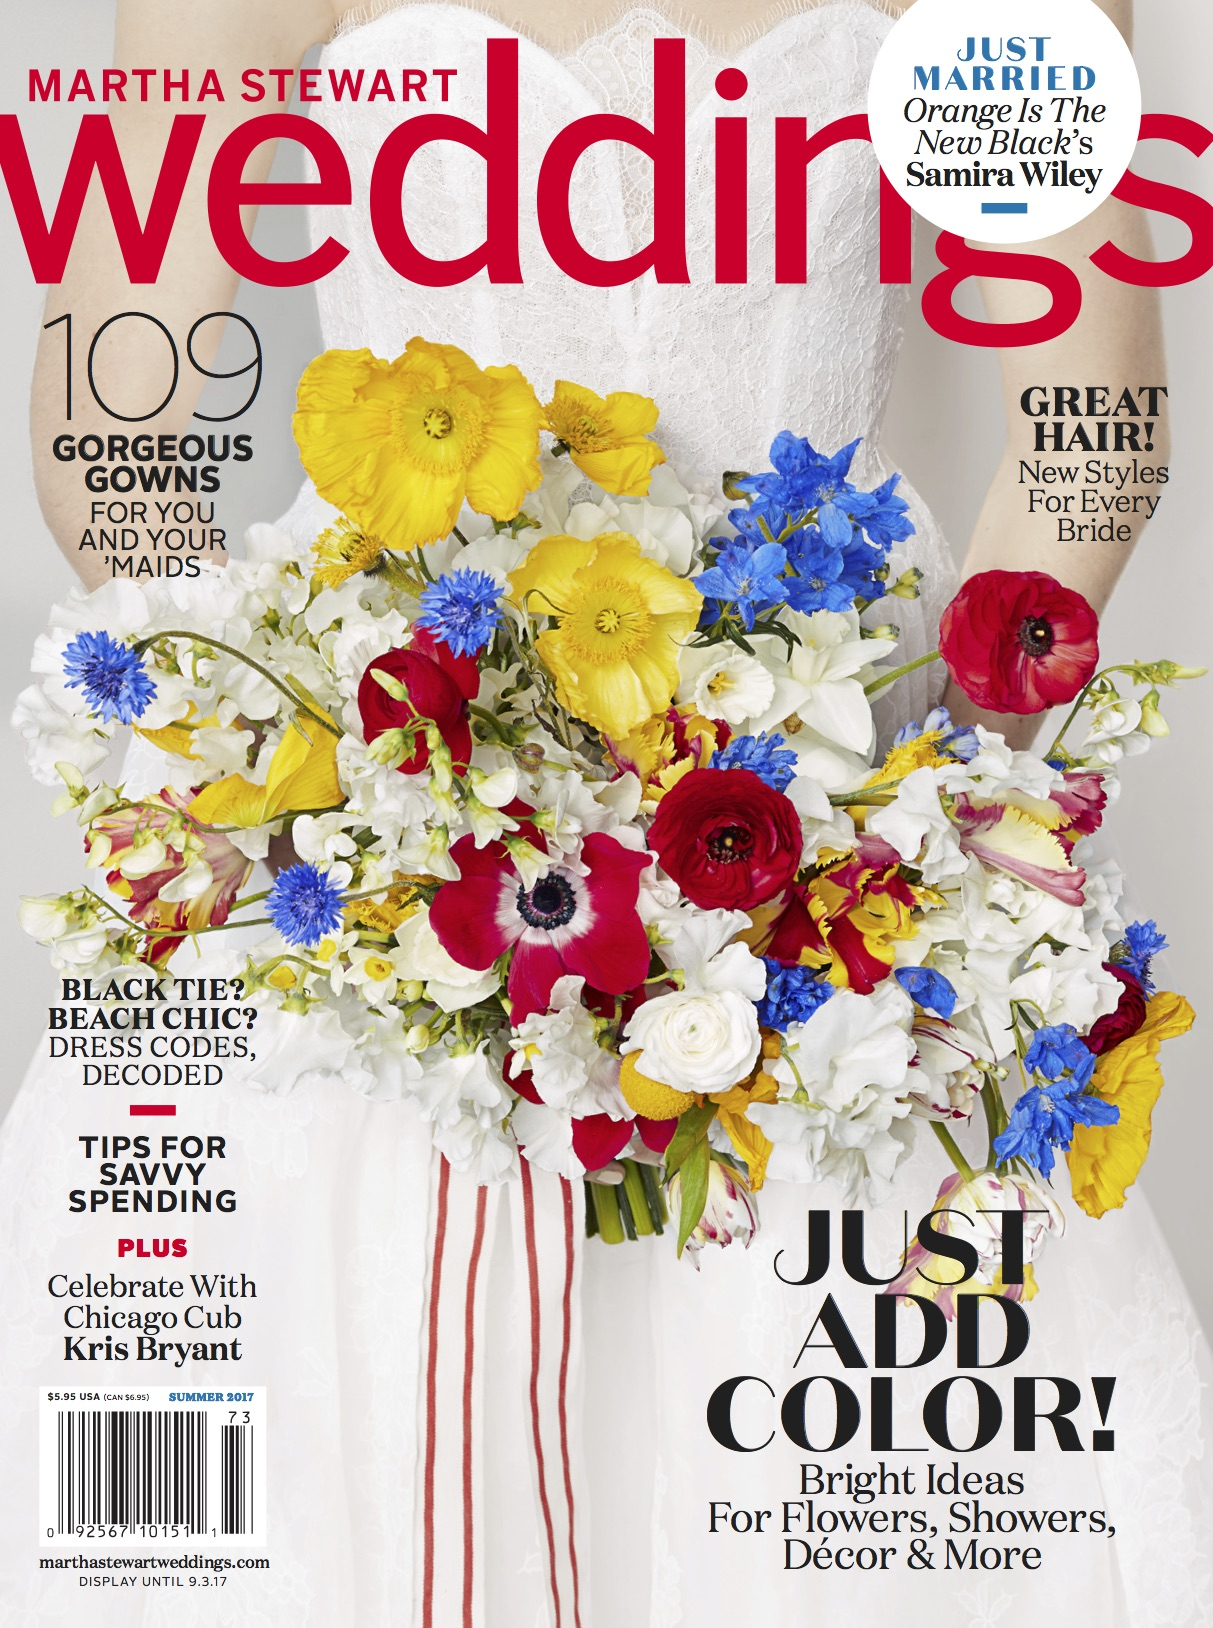 Martha Stewart Weddings Summer 2017 Cover